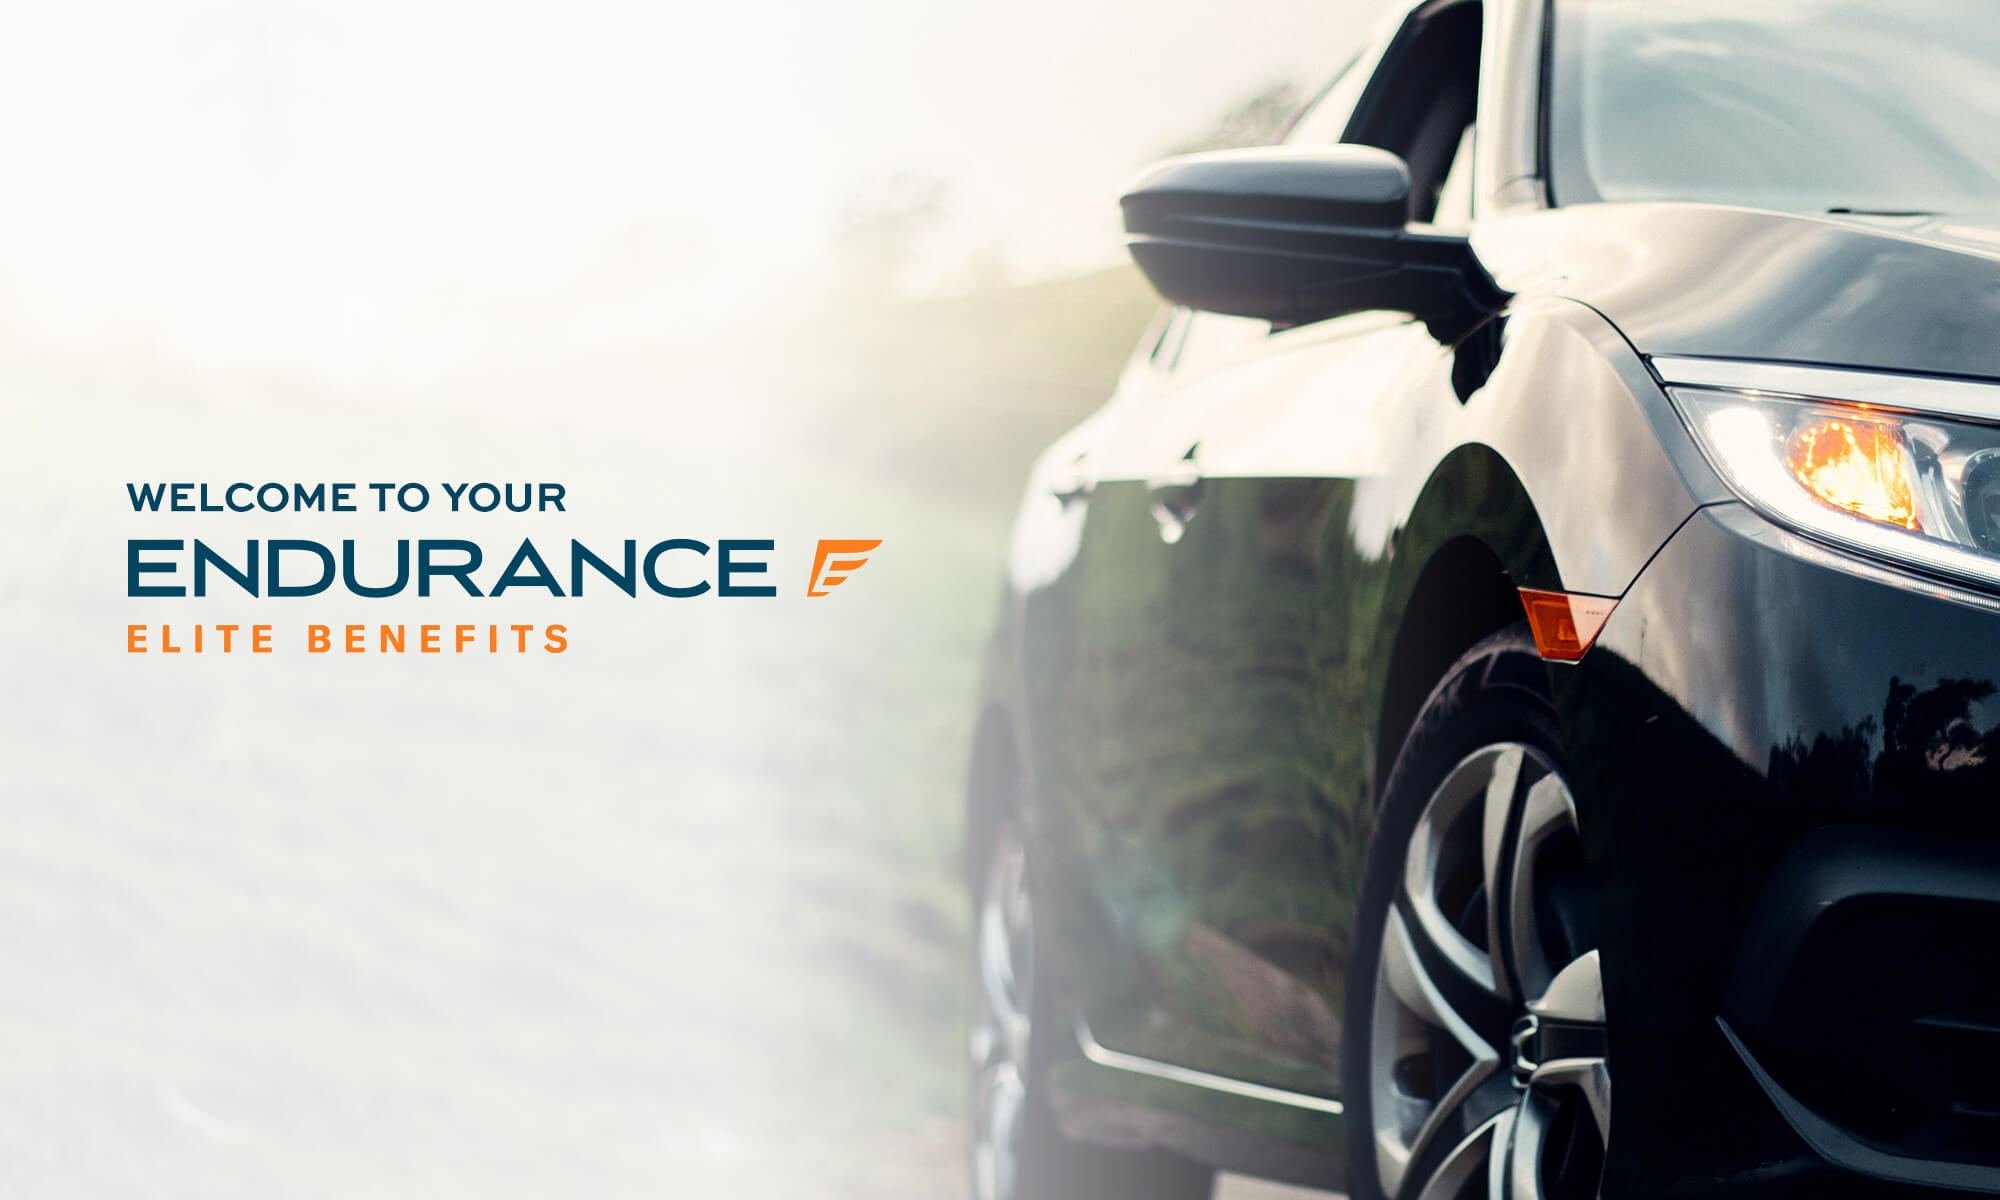 Elite benefits offered by Endurance, showing a black sedan car